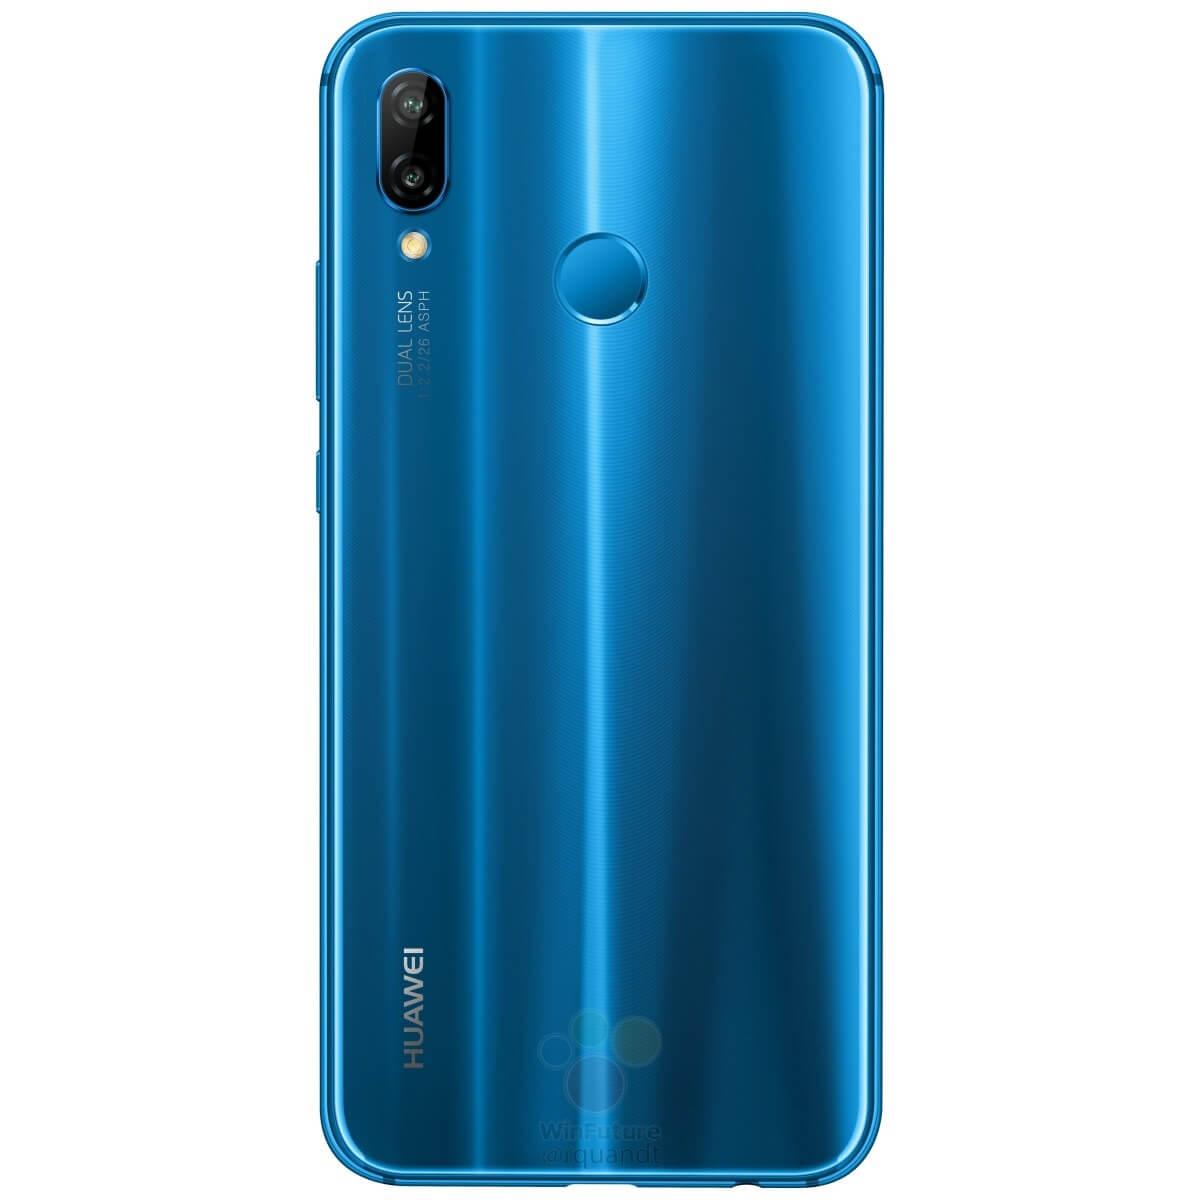 Huawei-P20-Lite-Blue-2